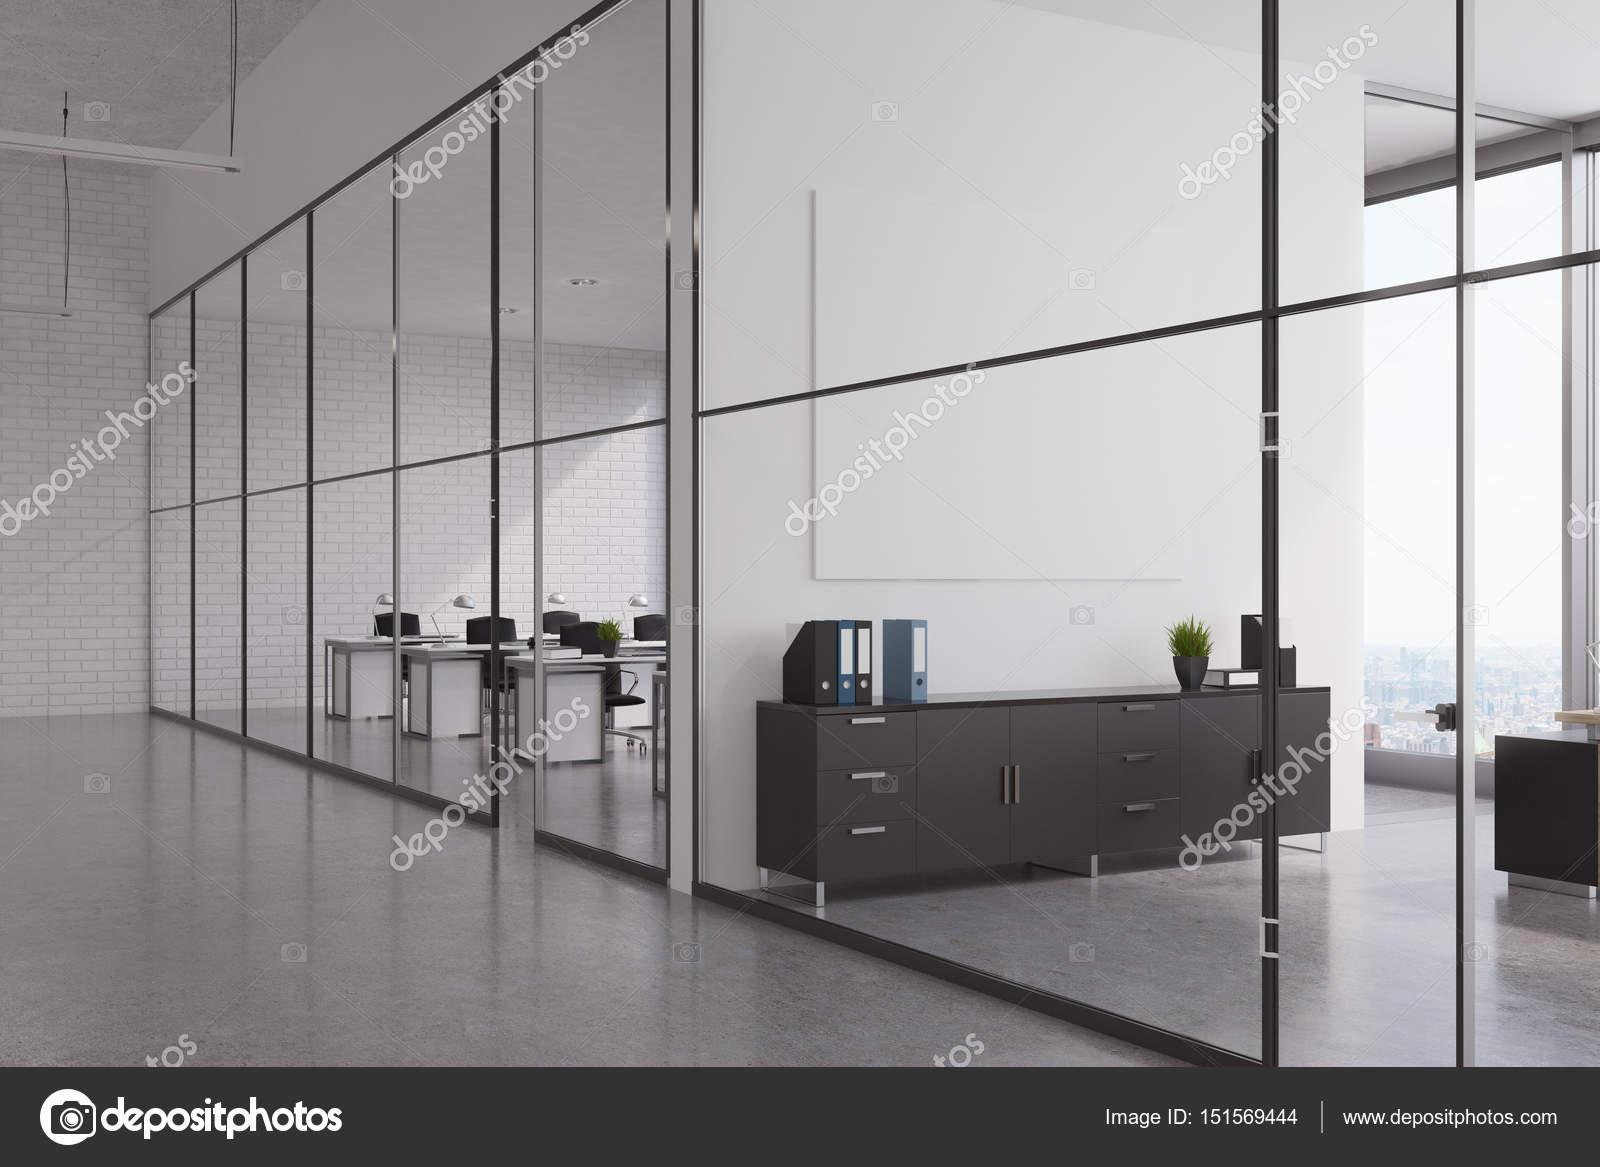 Büro Lobby Mit Glaswänden Stockfoto Denisismagilov 151569444